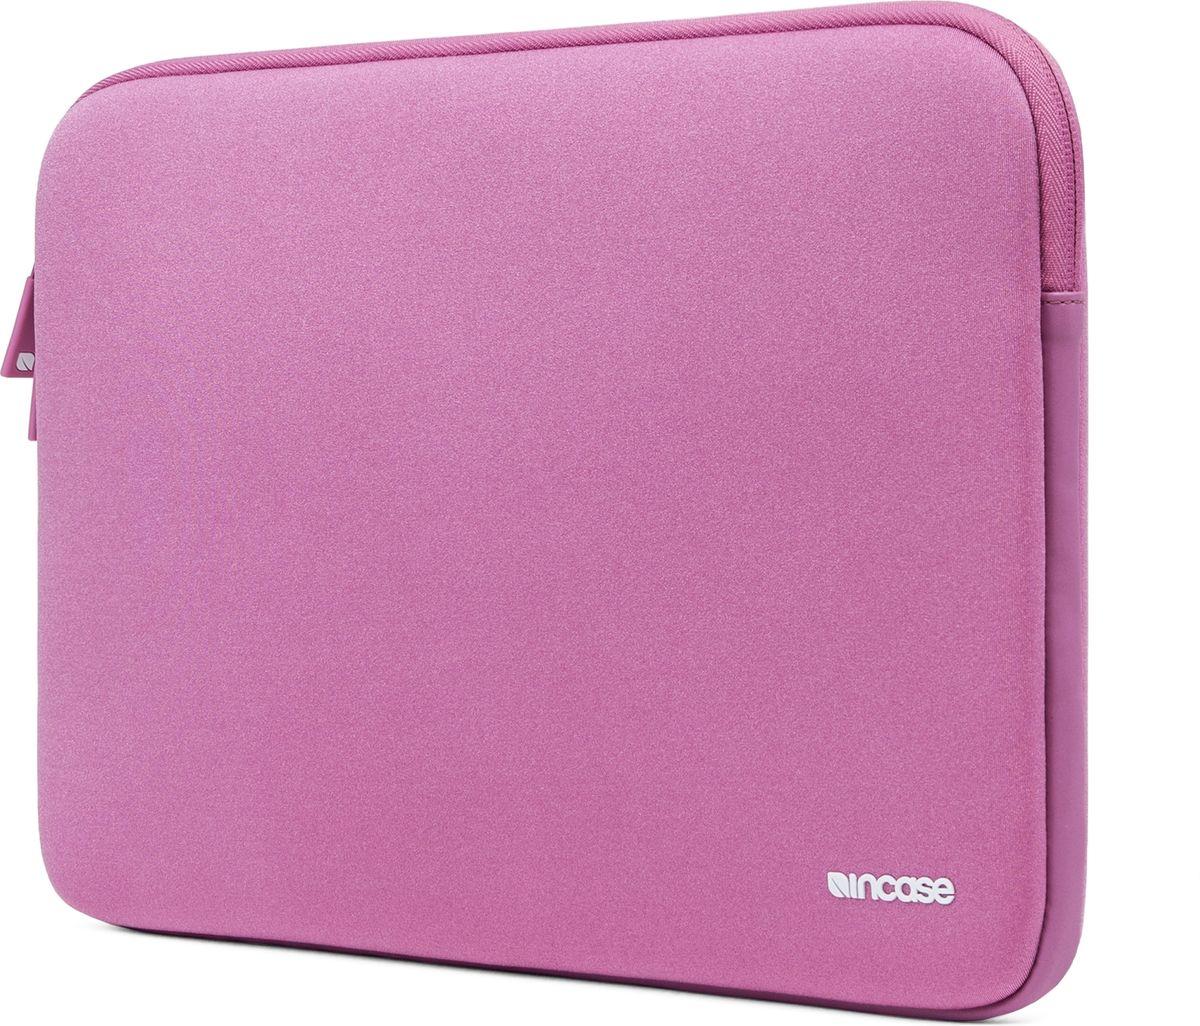 "Incase Neoprene Classic Sleeve чехол для Apple MacBook 15"", Orchid CL90044"